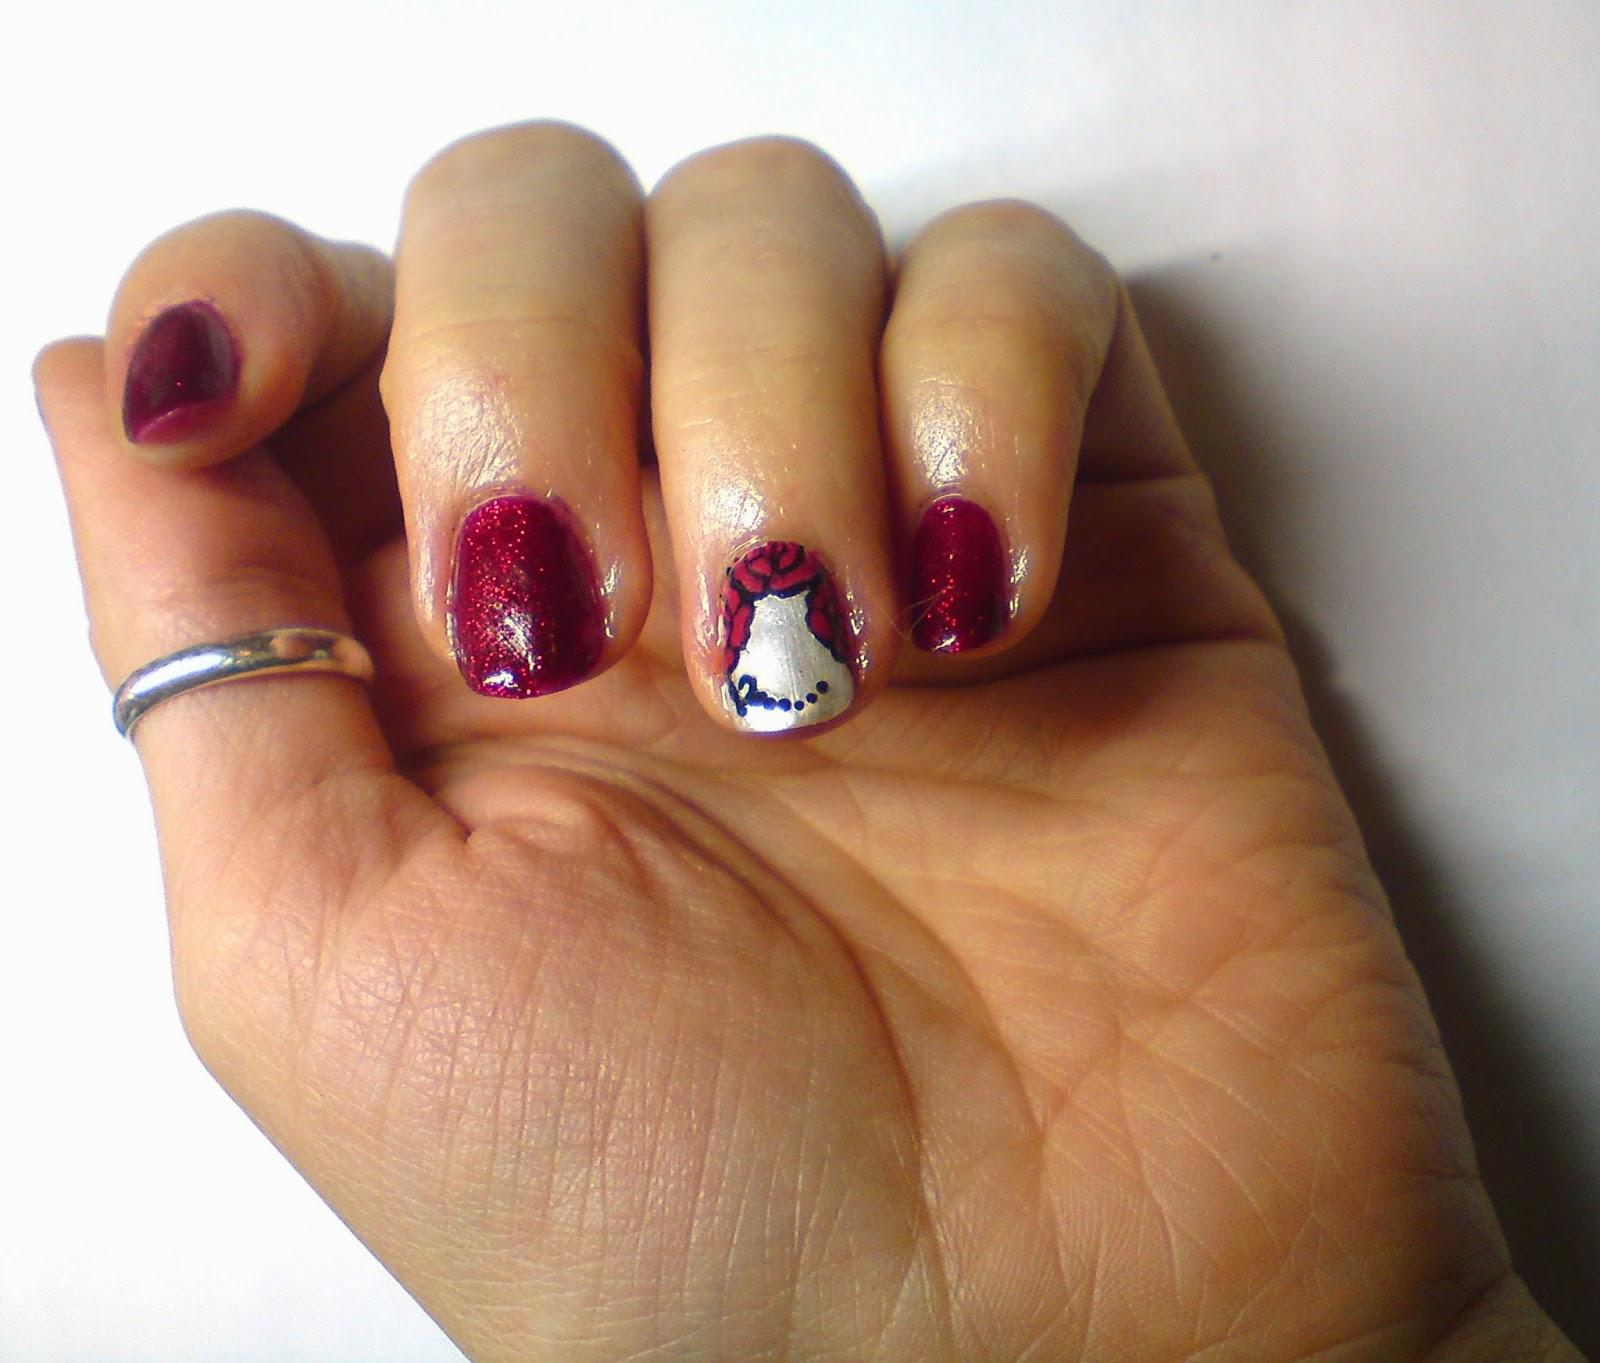 http://lunalithe.blogspot.fr/2014/06/ruby-pump-et-platinum-pearl.html